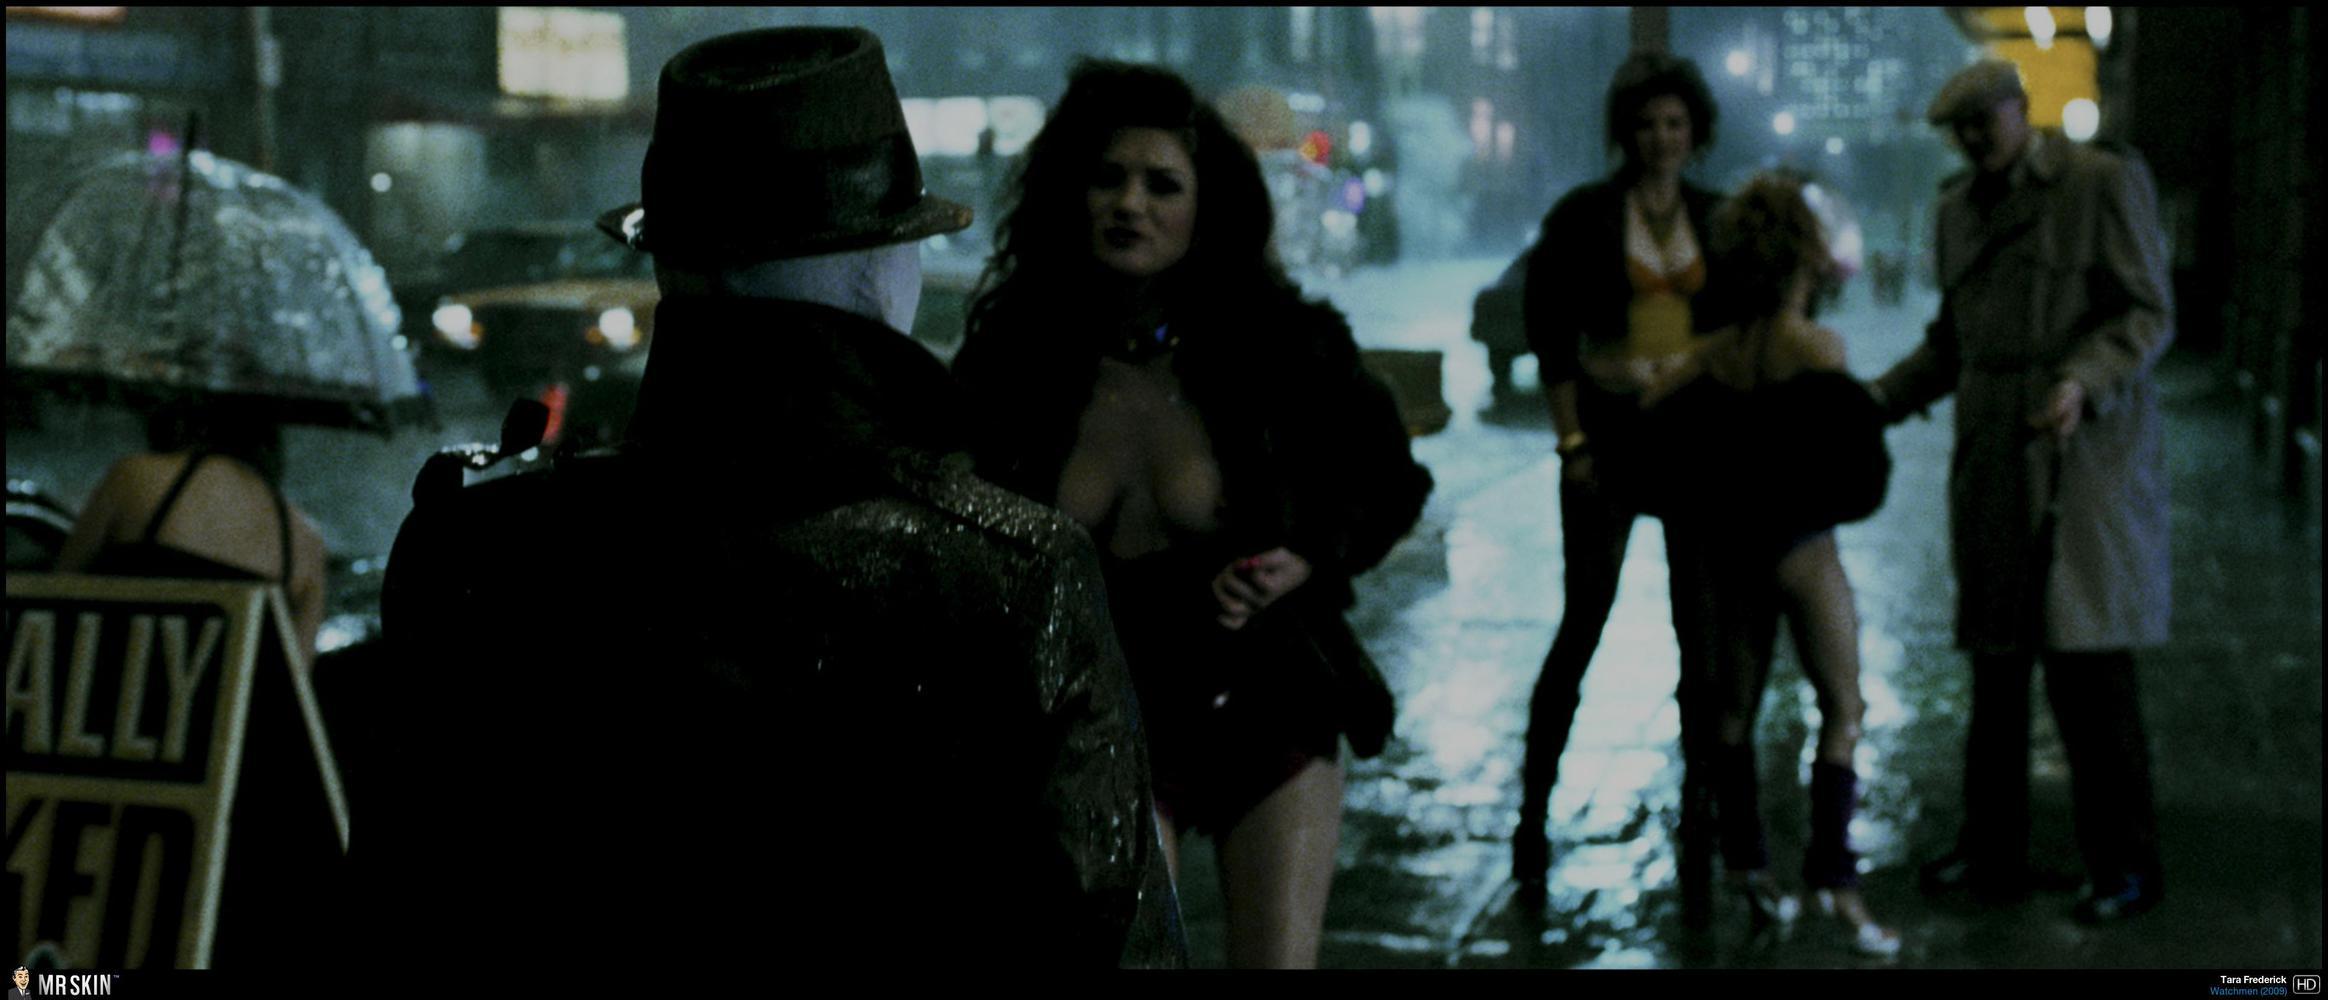 Nude scene in watchmen